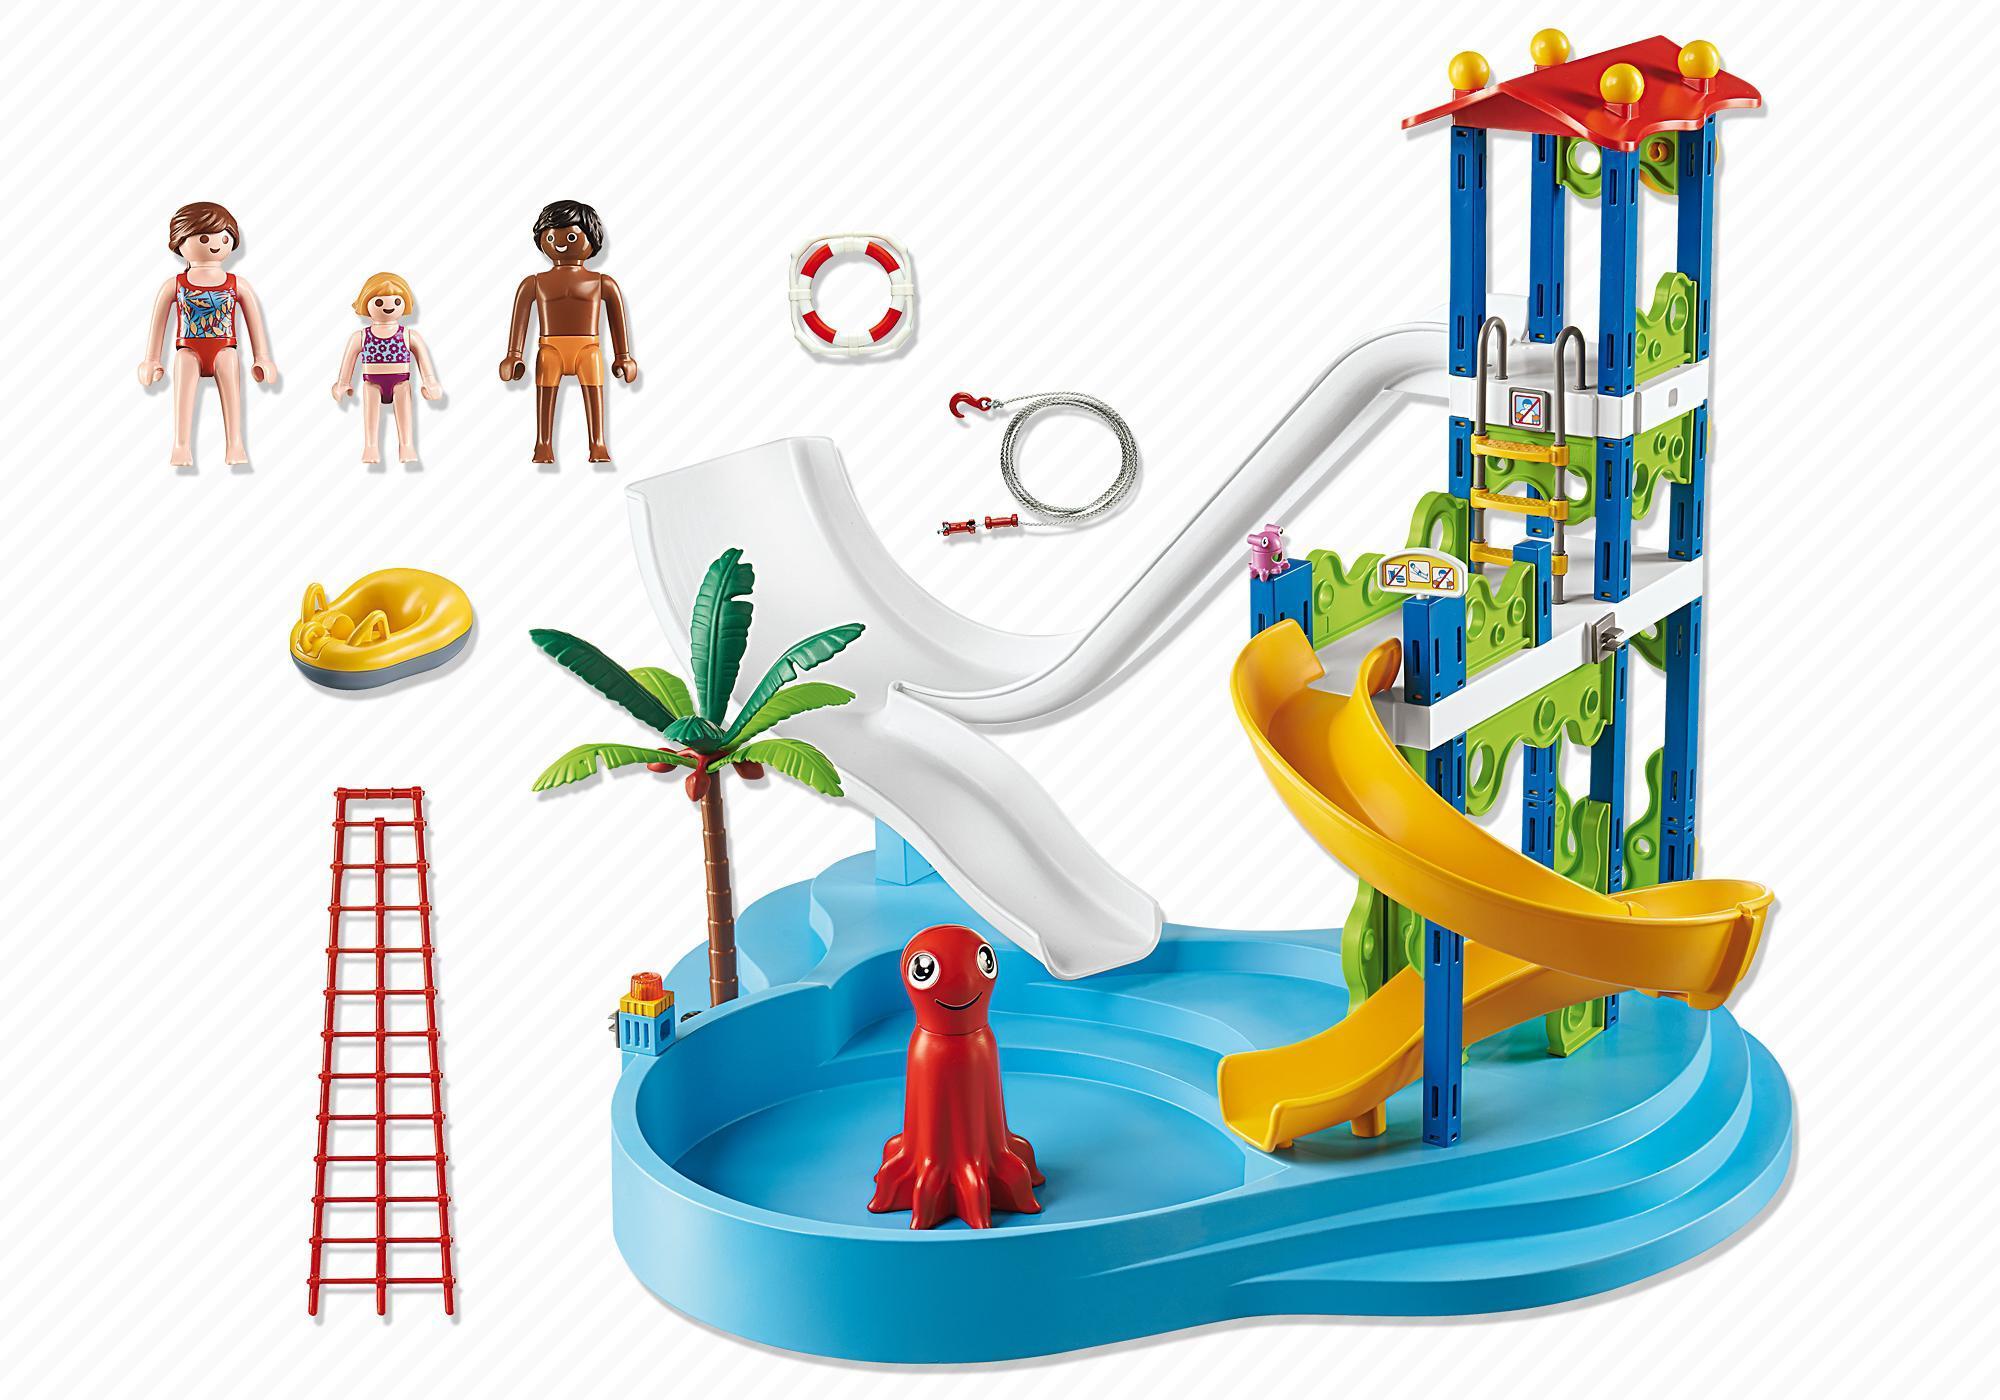 http://media.playmobil.com/i/playmobil/6669_product_box_back/Torre degli scivoli con piscina